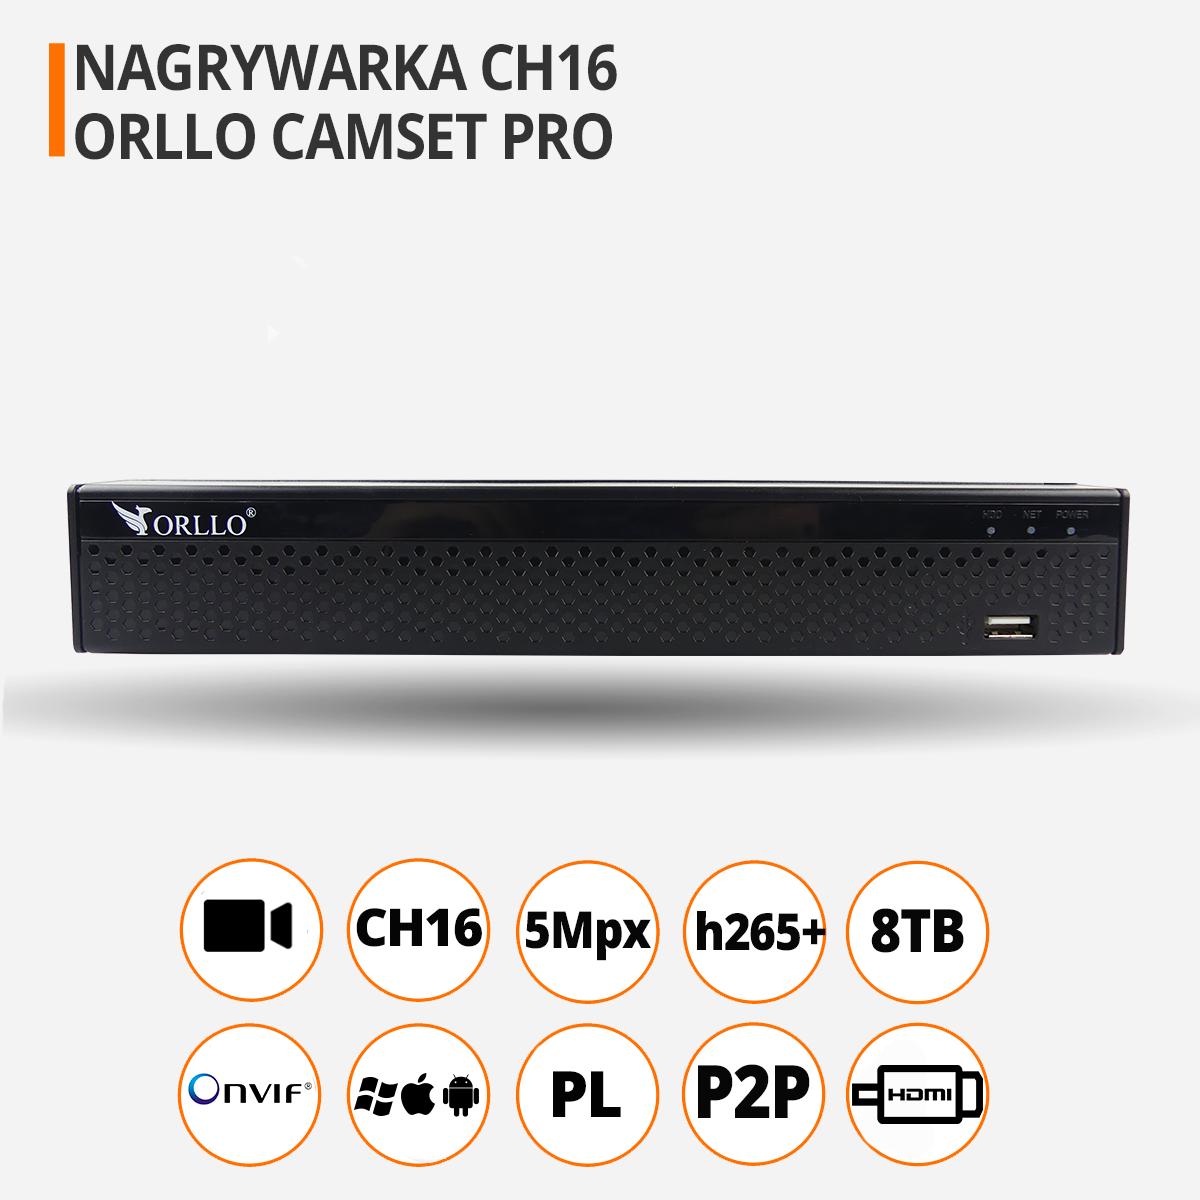 Rejestrator nvr do monitoringu ch16 16 kamer funkcje orllo.pl